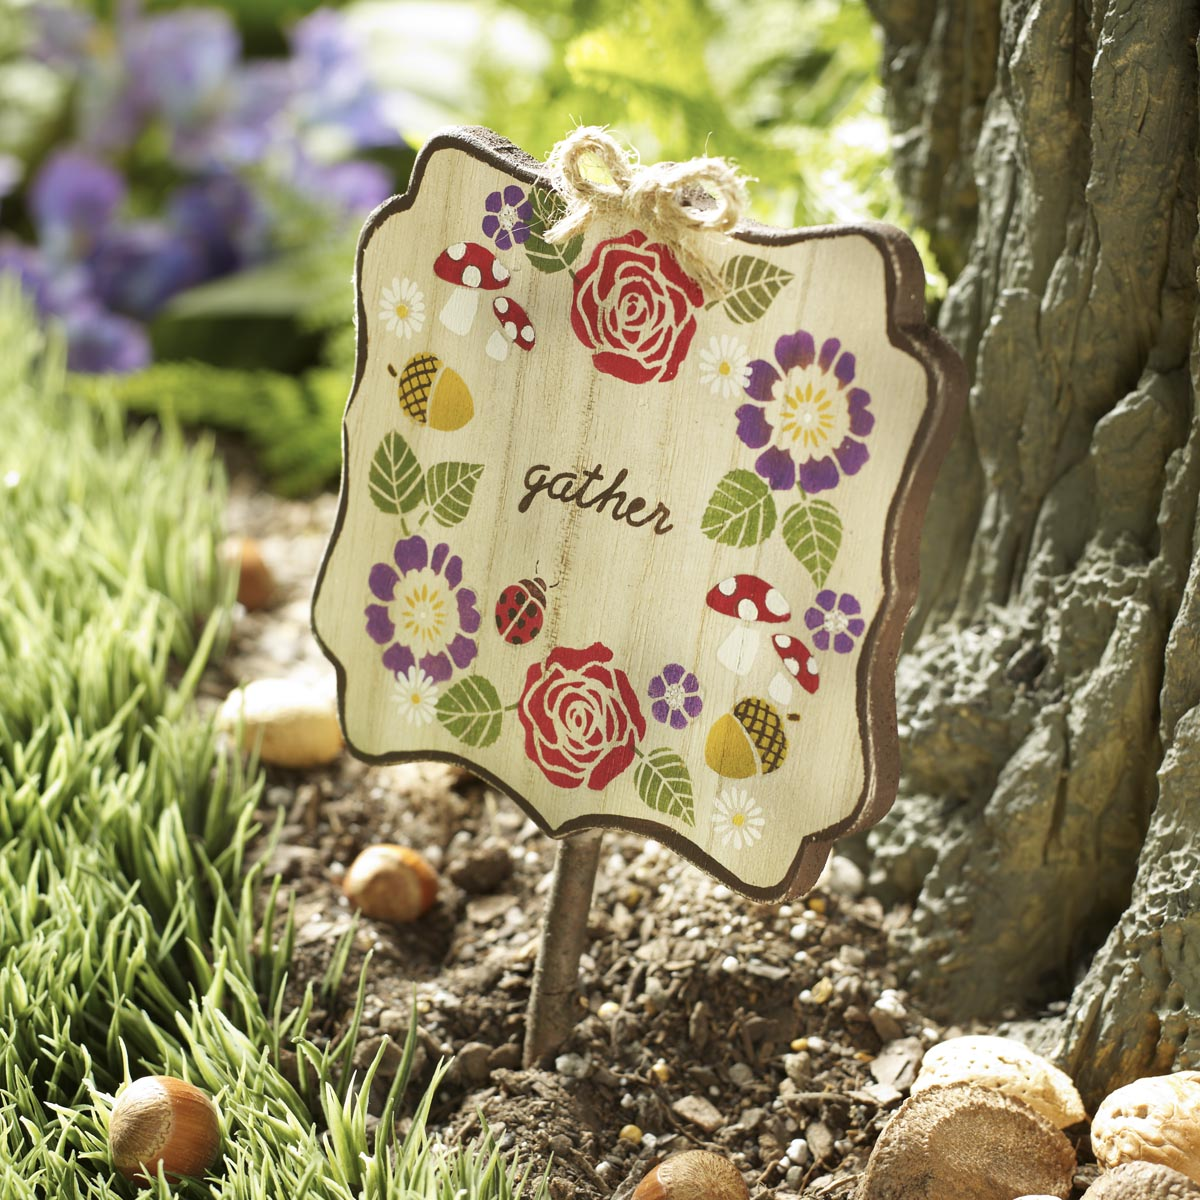 FolkArt ® Painting Stencils - Mini - Garden